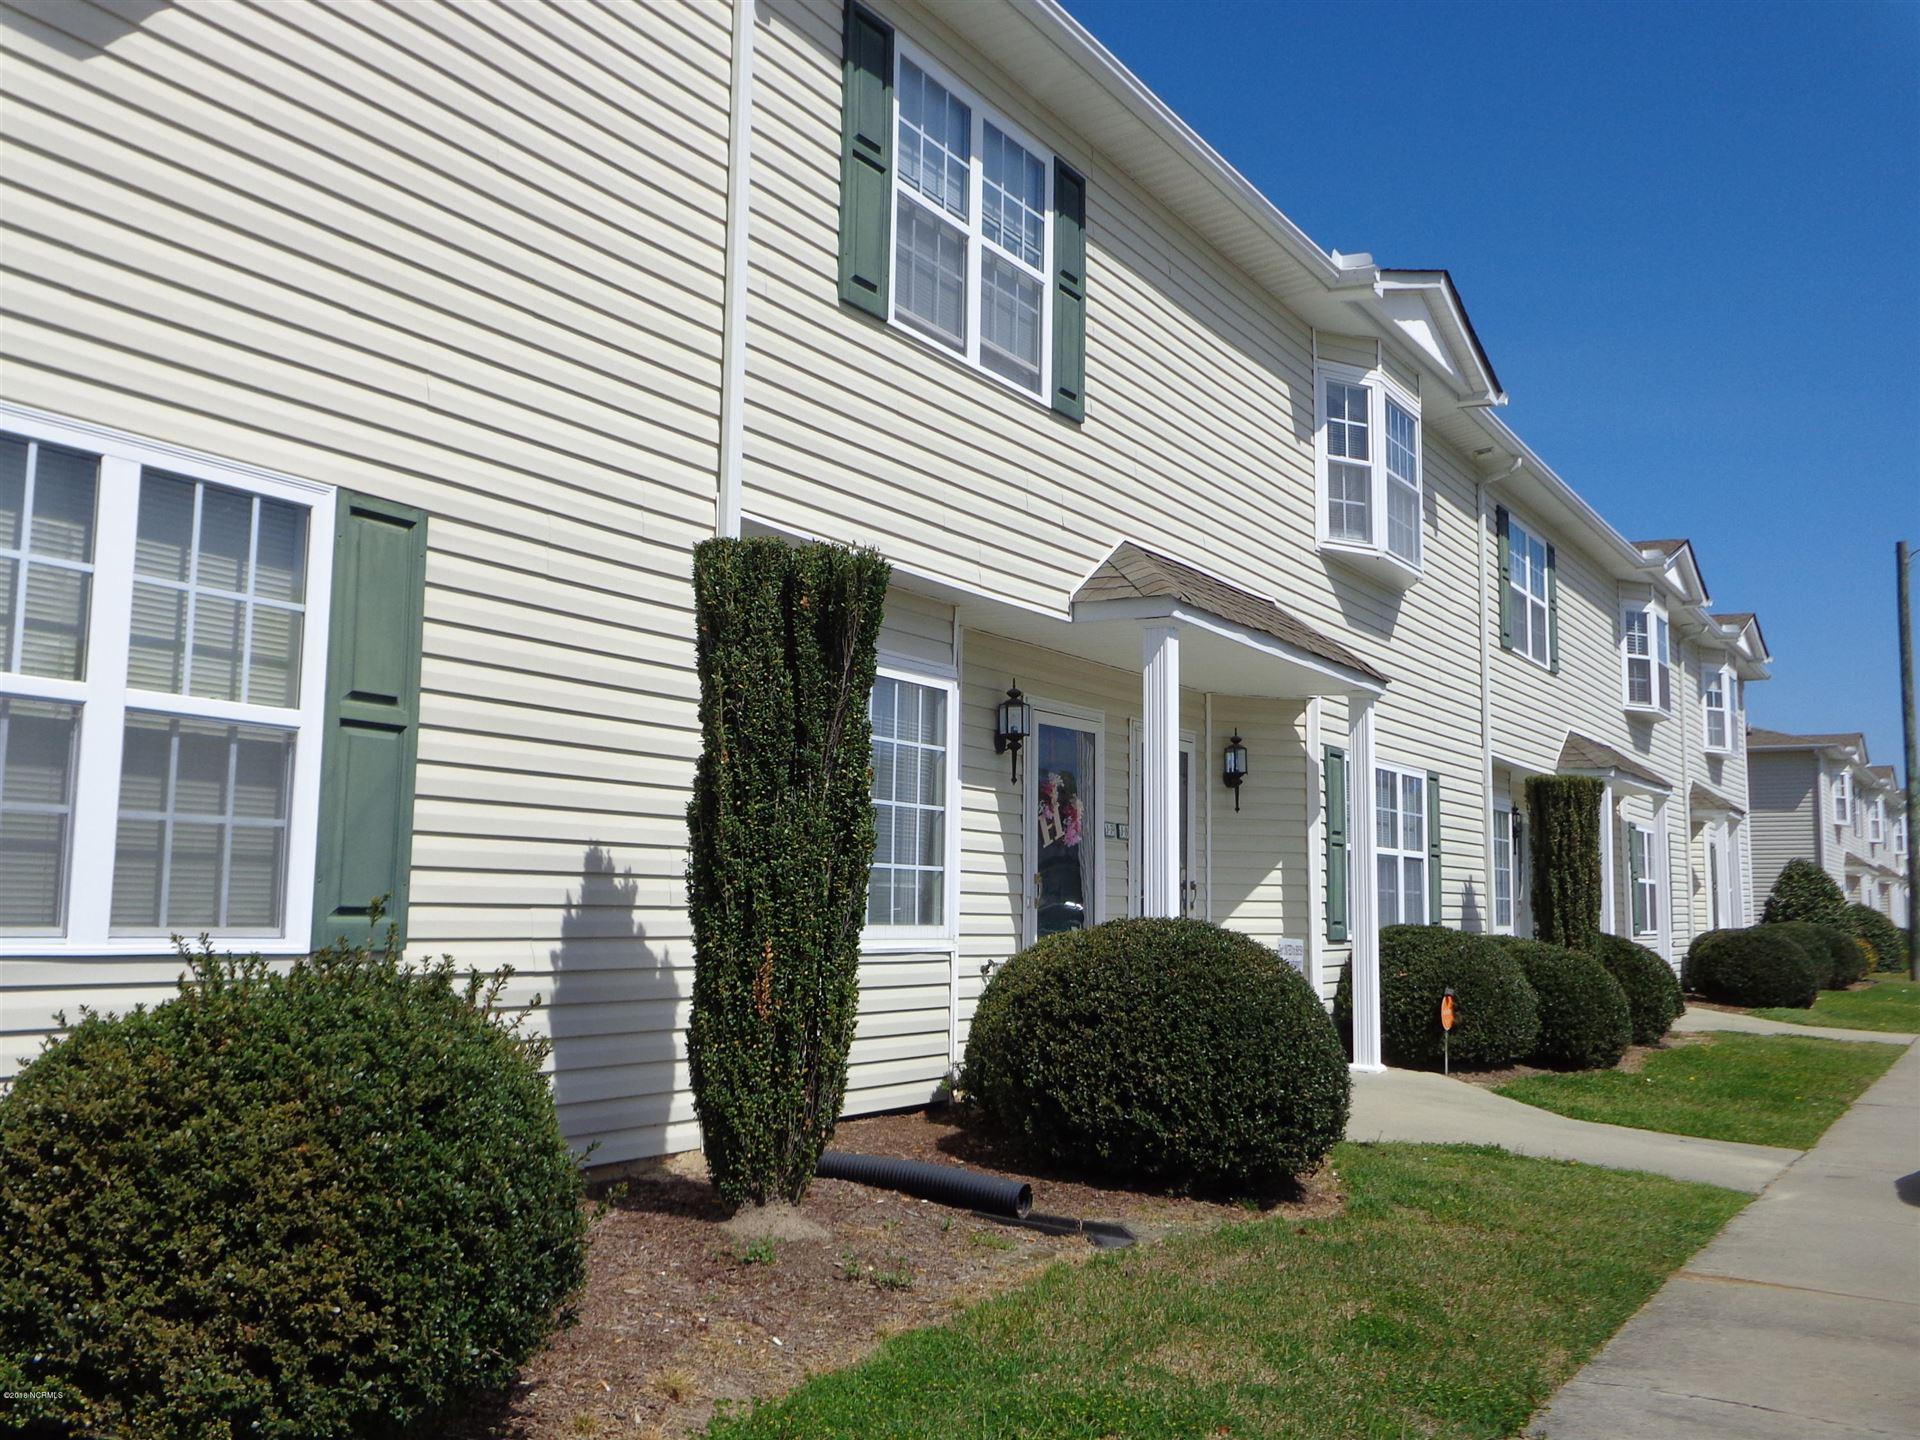 Photo for 2380 Vineyard Drive #J4, Winterville, NC 28590 (MLS # 100109492)